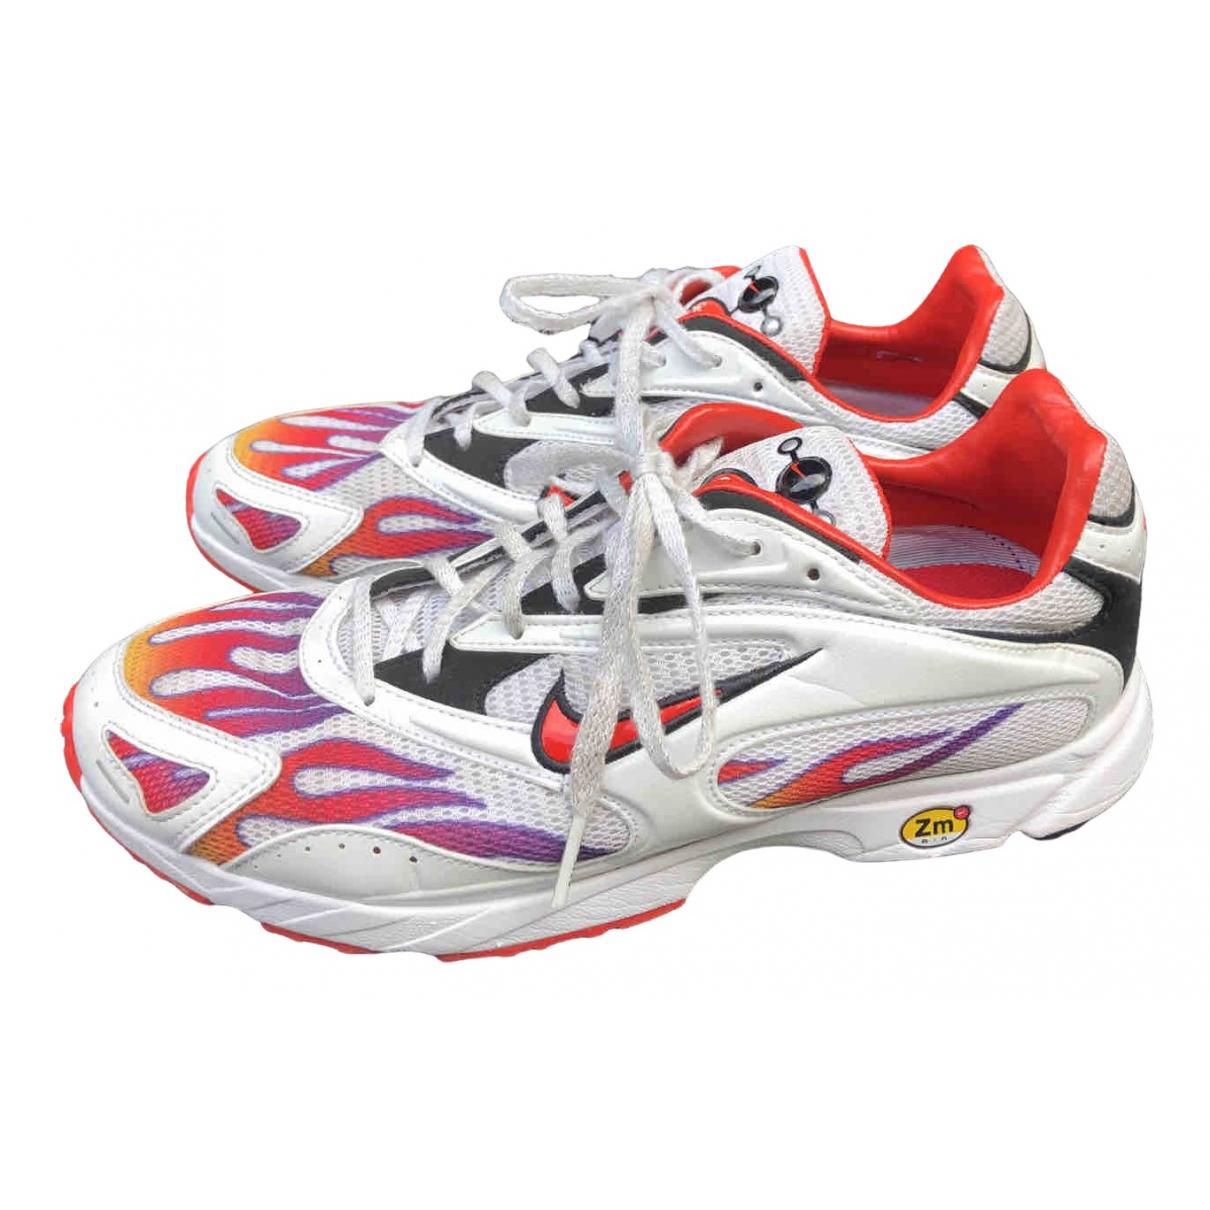 Nike X Supreme Zoom Streak Spectrum Plus White Leather Trainers for Women 7.5 UK